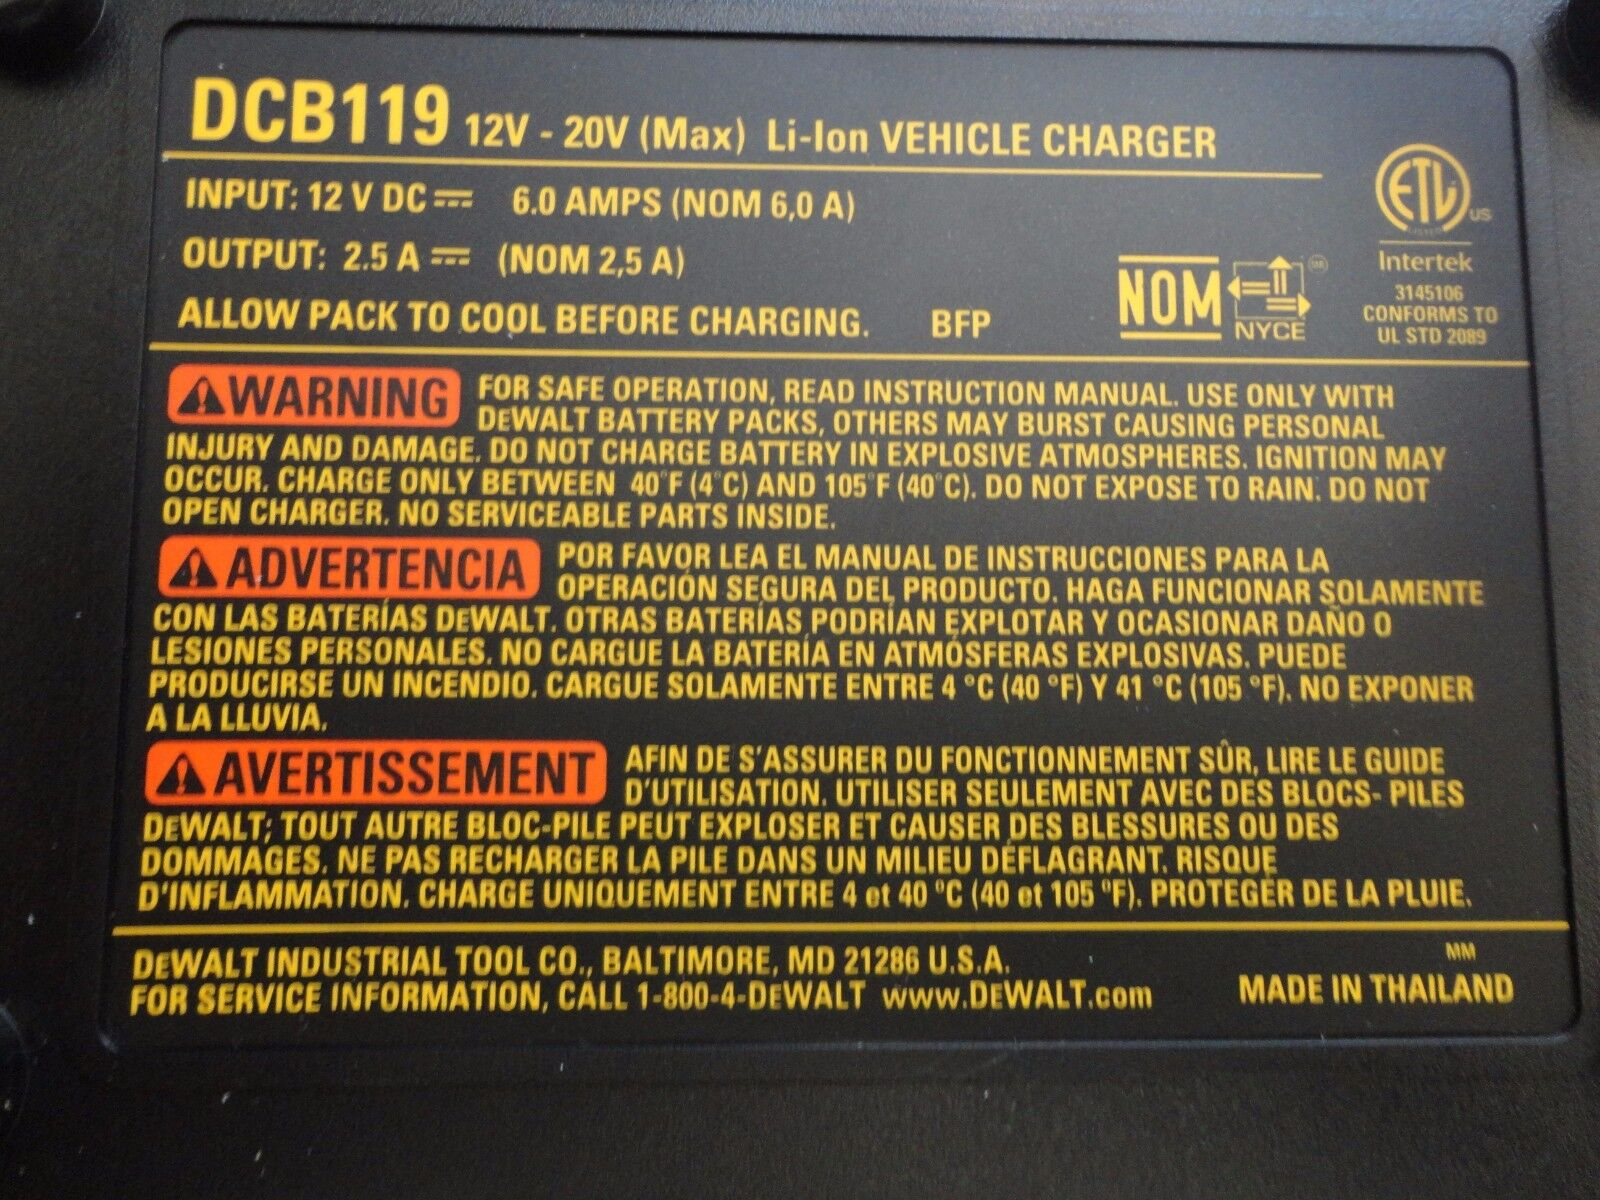 Dewalt DCB119 12 Volt 20 Volt Lithium Ion Vehicle